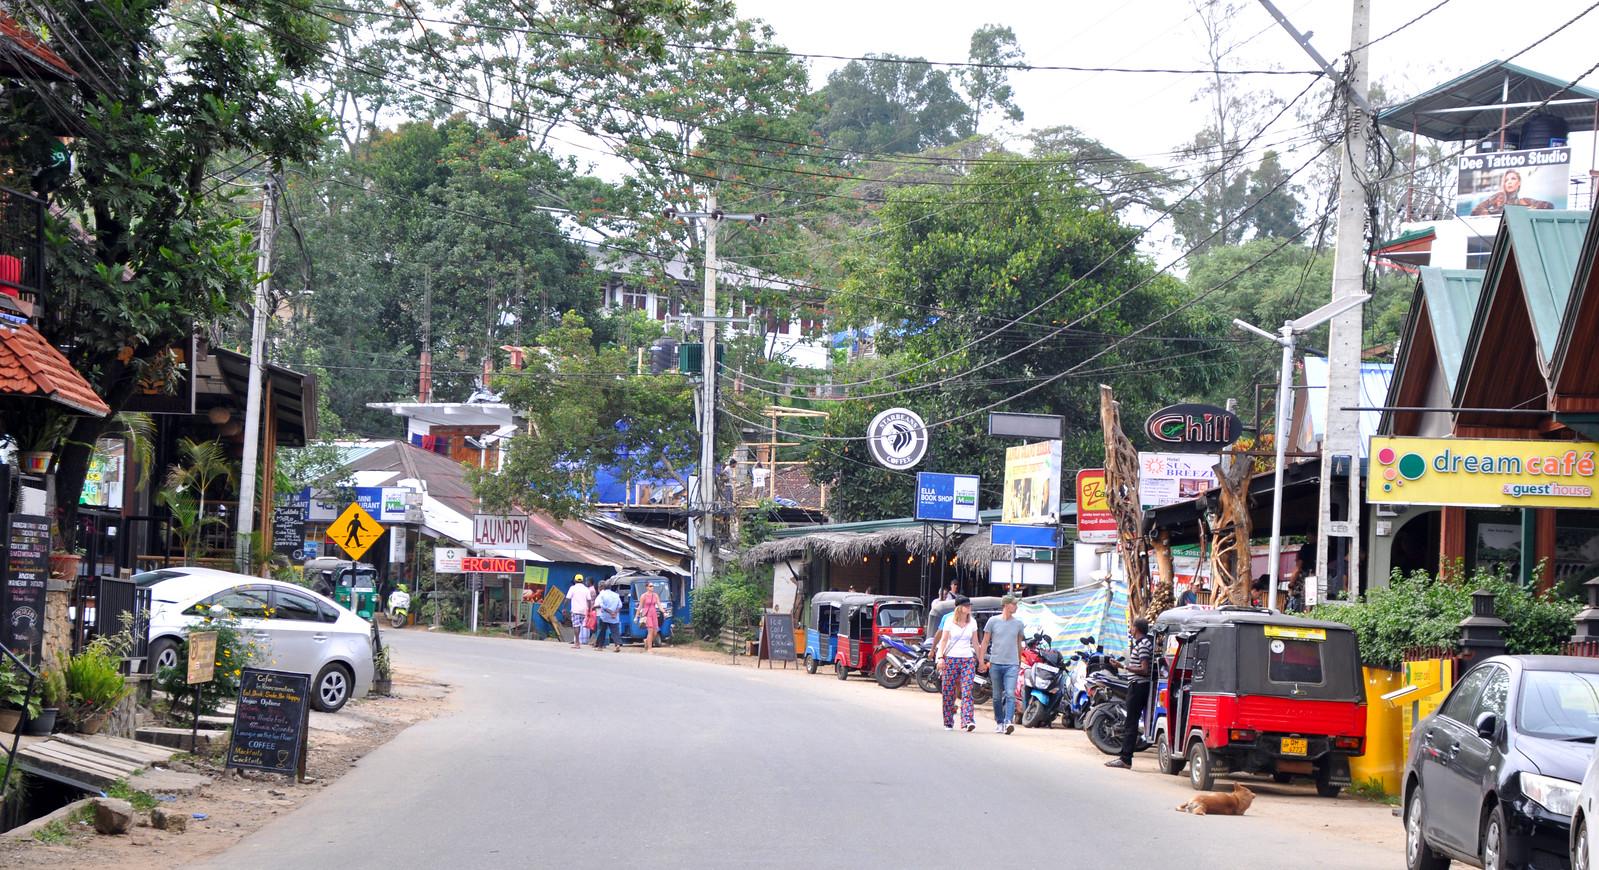 Tren de Ella, Ella Railway - Sri Lanka tren de ella - 39931040013 c01324a359 h - Tren de Ella en Sri Lanka: ¿El viaje en tren más pintoresco del mundo?